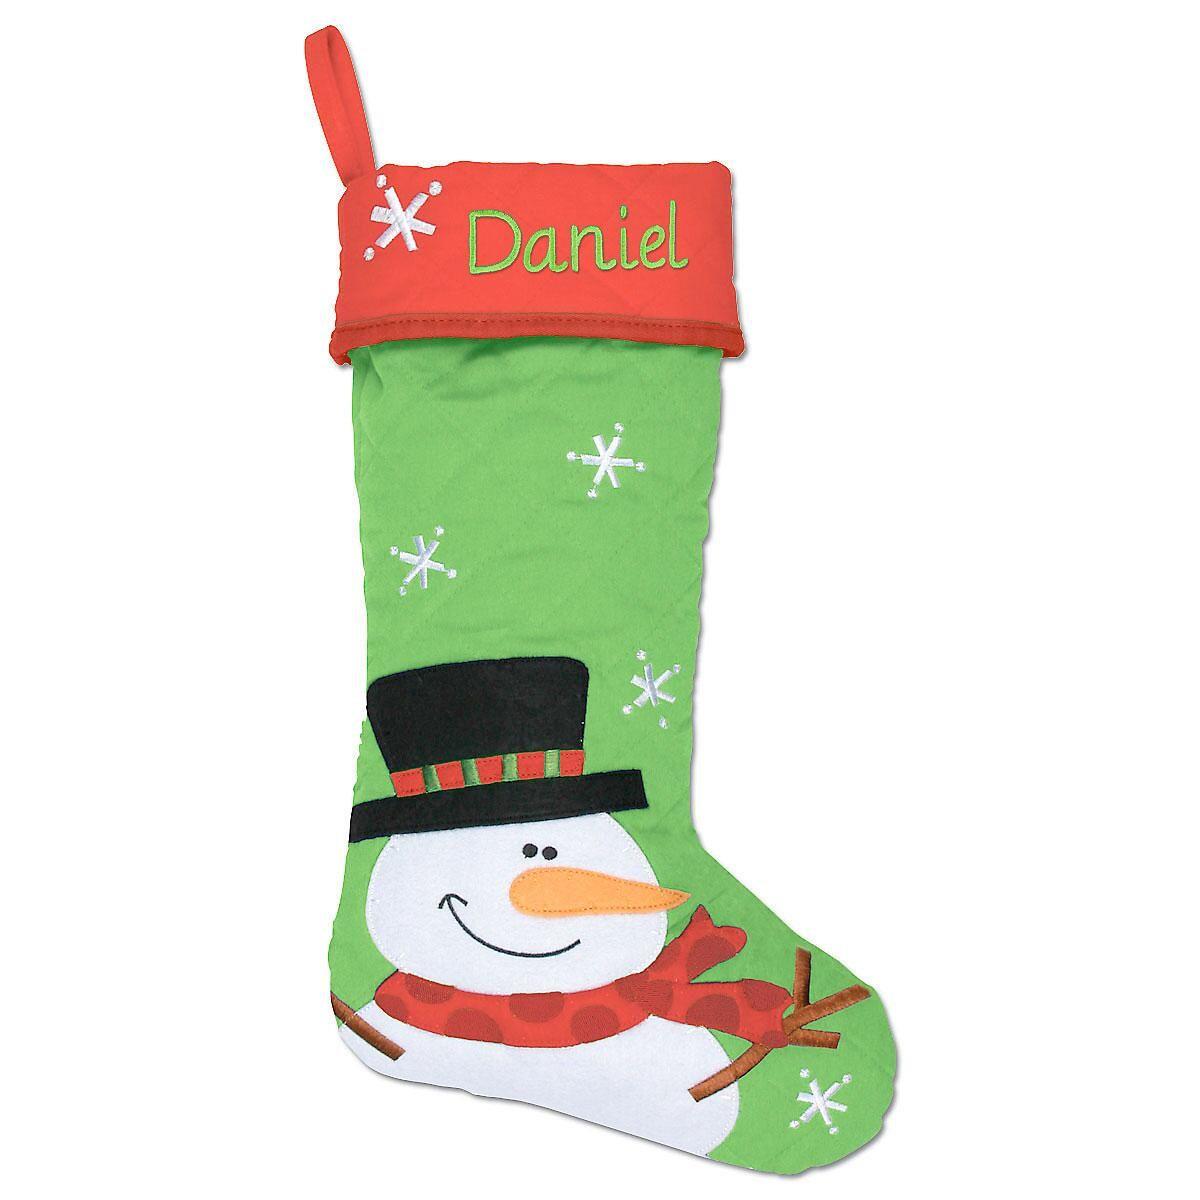 Snowman Personalized Christmas Stocking by Stephen Joseph®